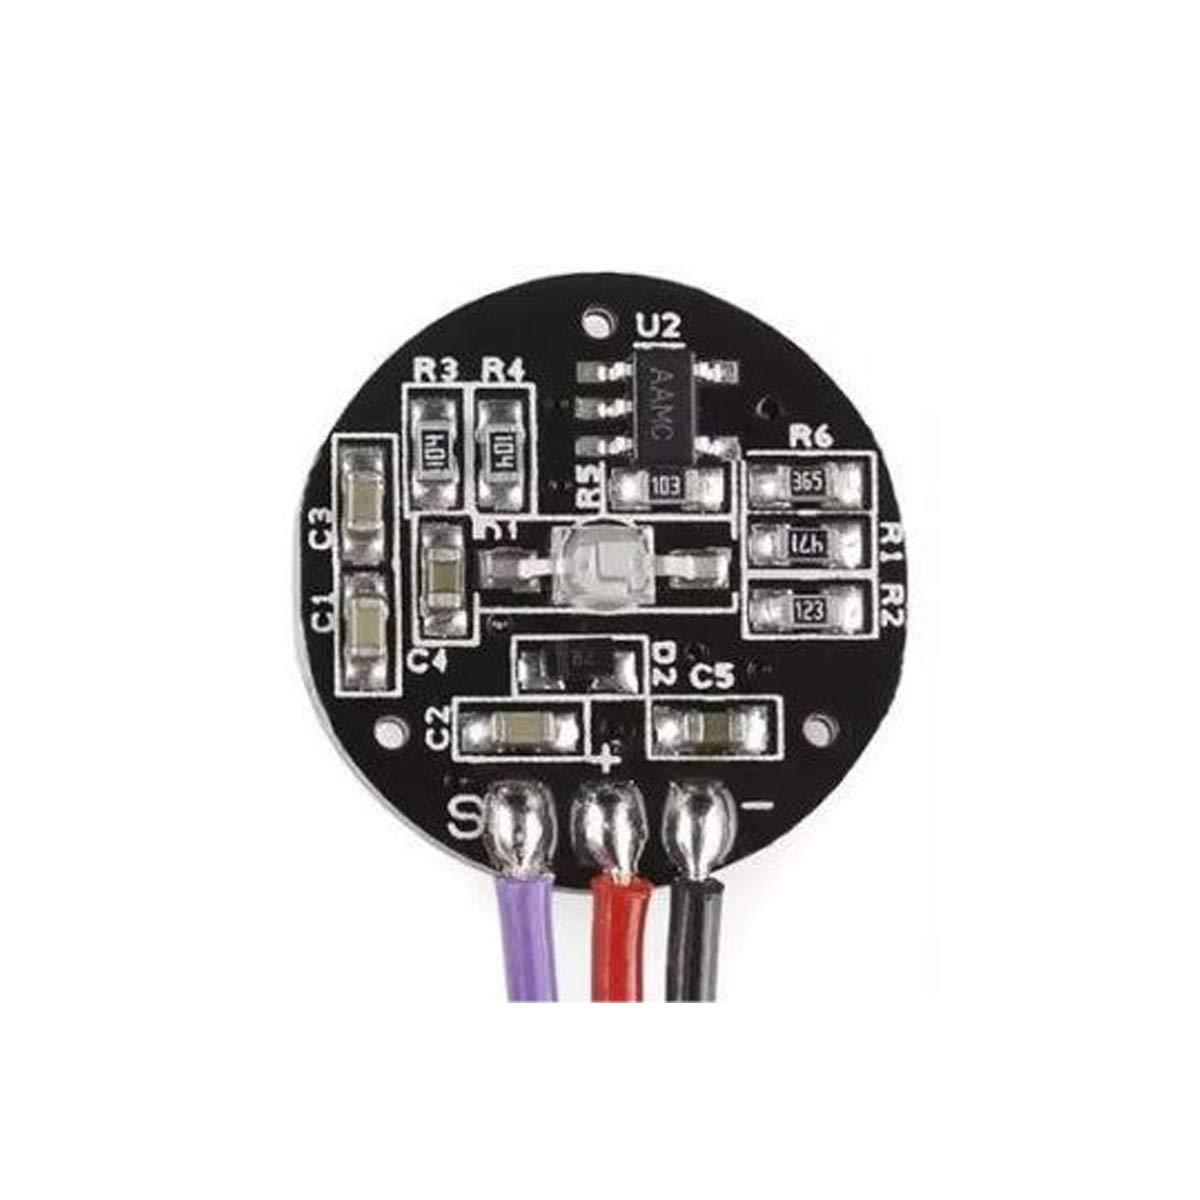 DEVMO Pulse Sensor Heart Rate Sensor Monitor PulseSensor for Arduino Module Raspberry